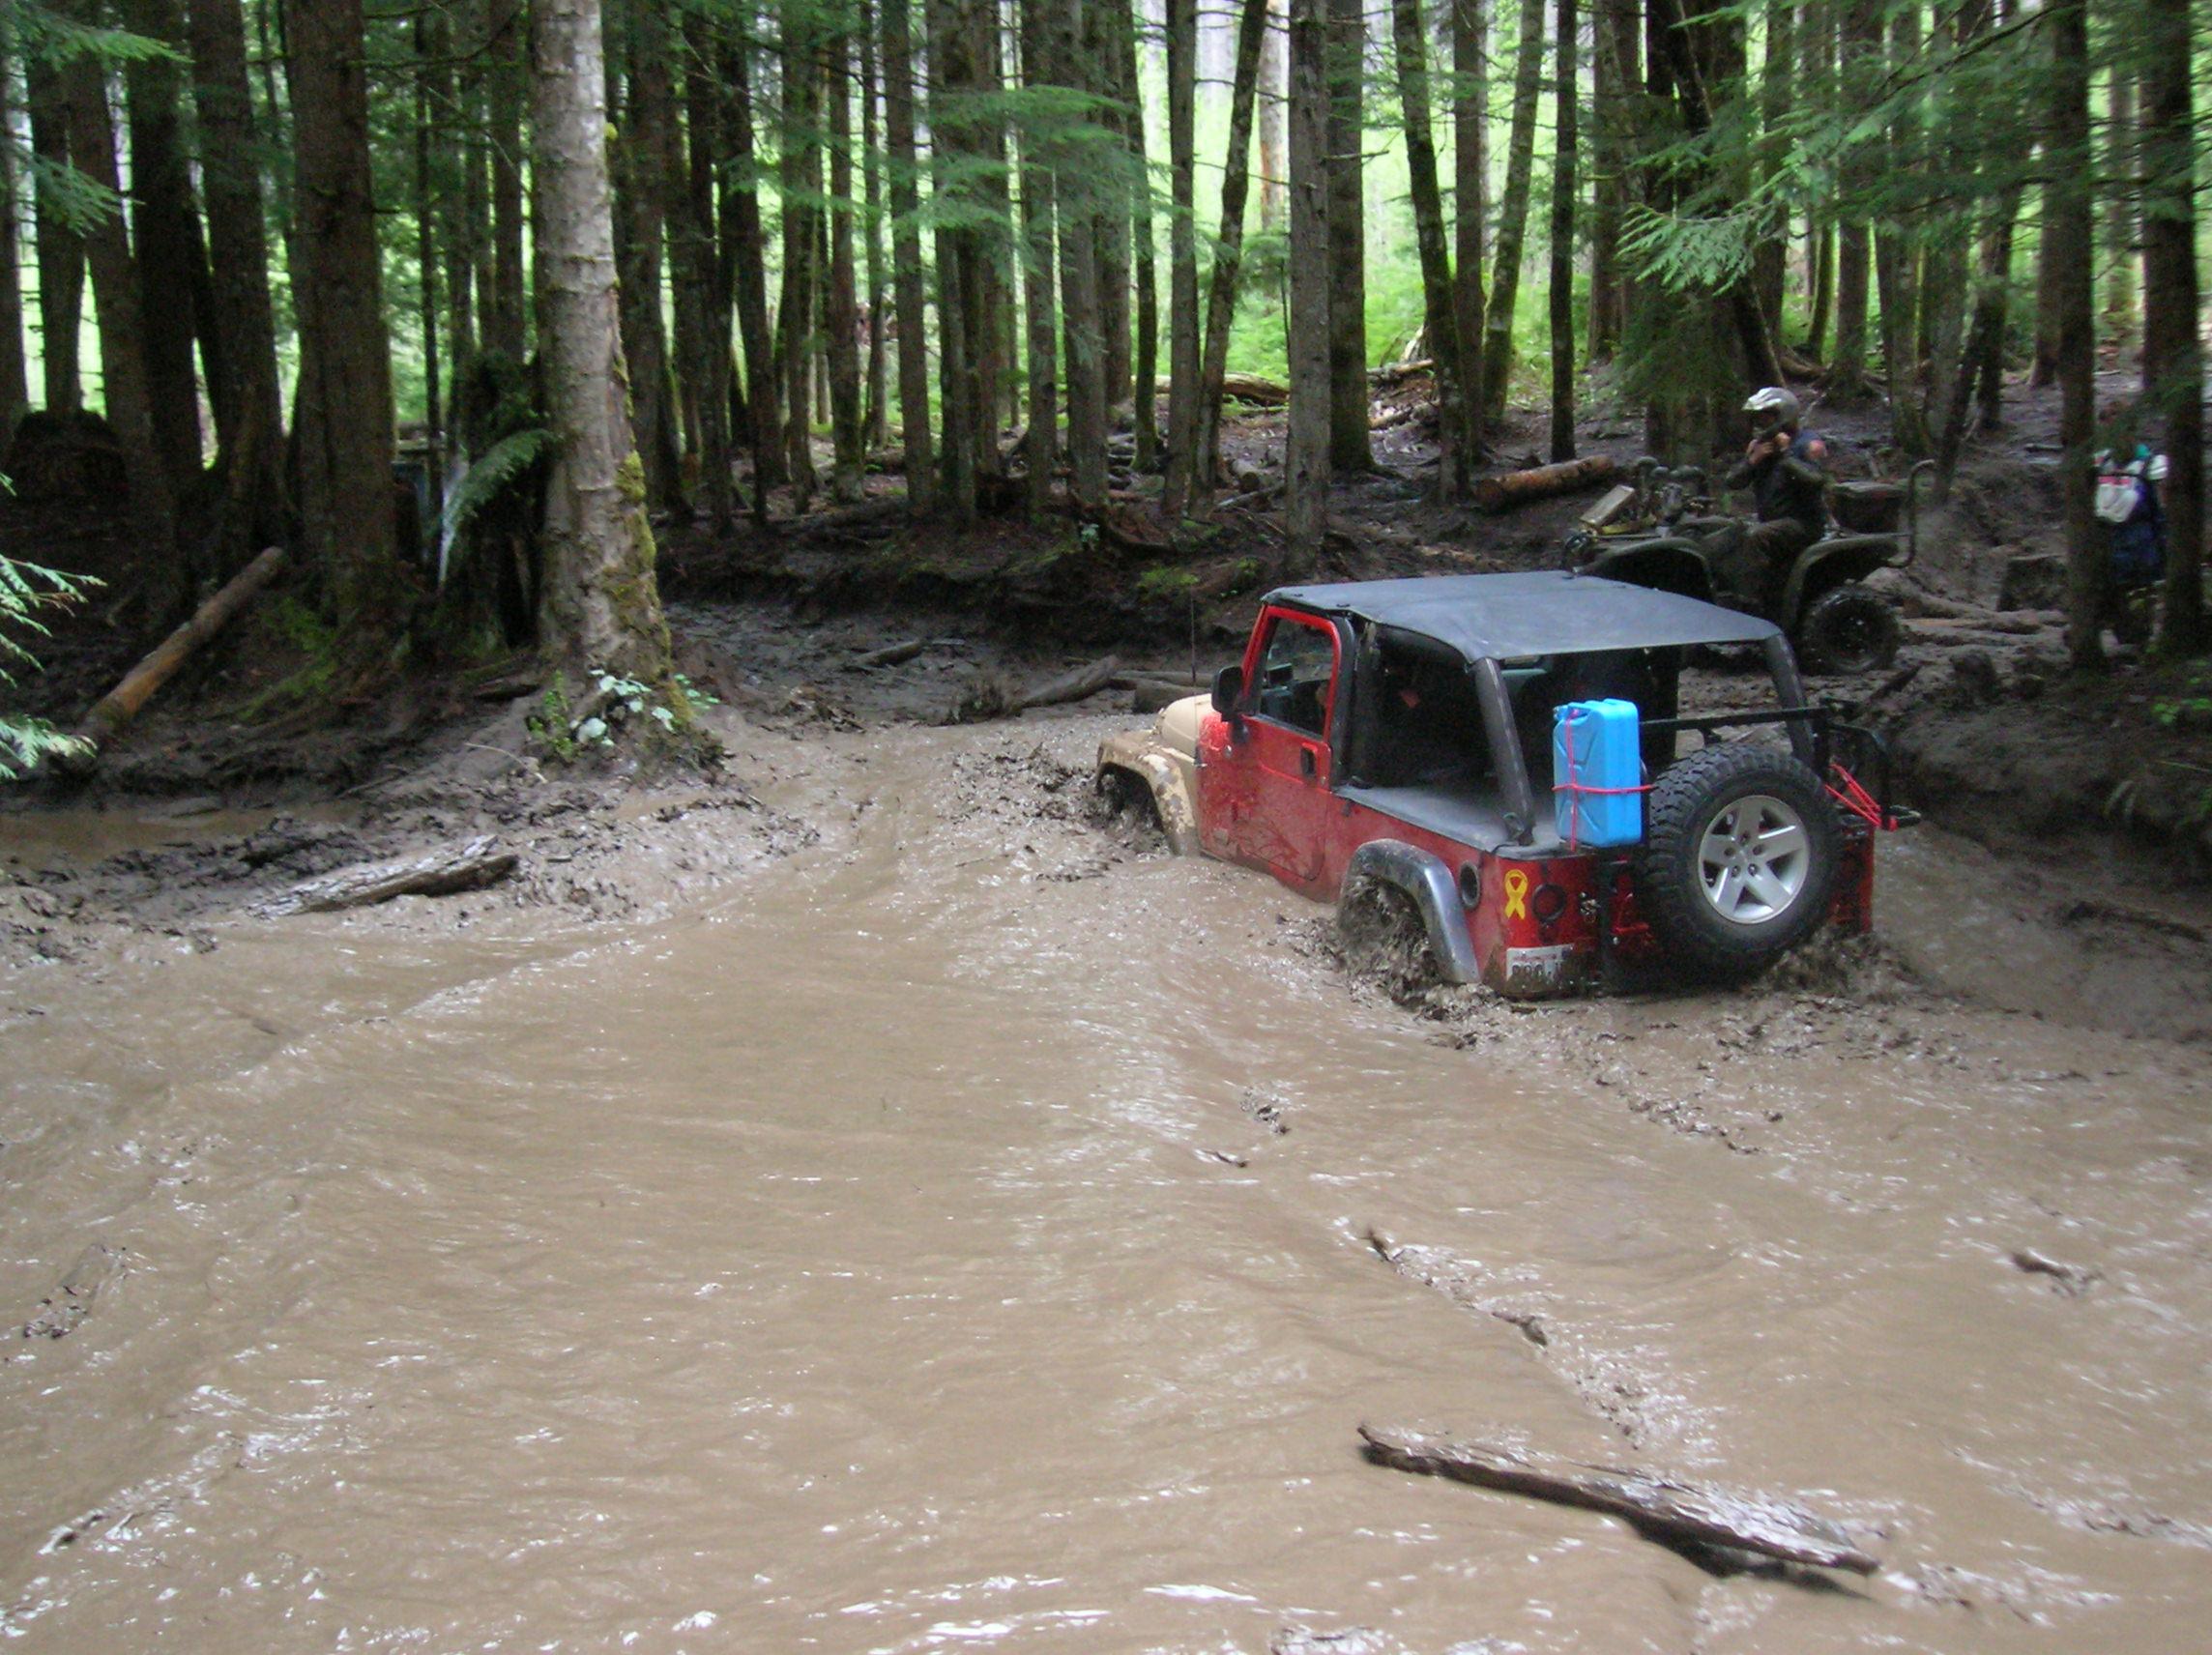 water mud unlimited LJ offroad